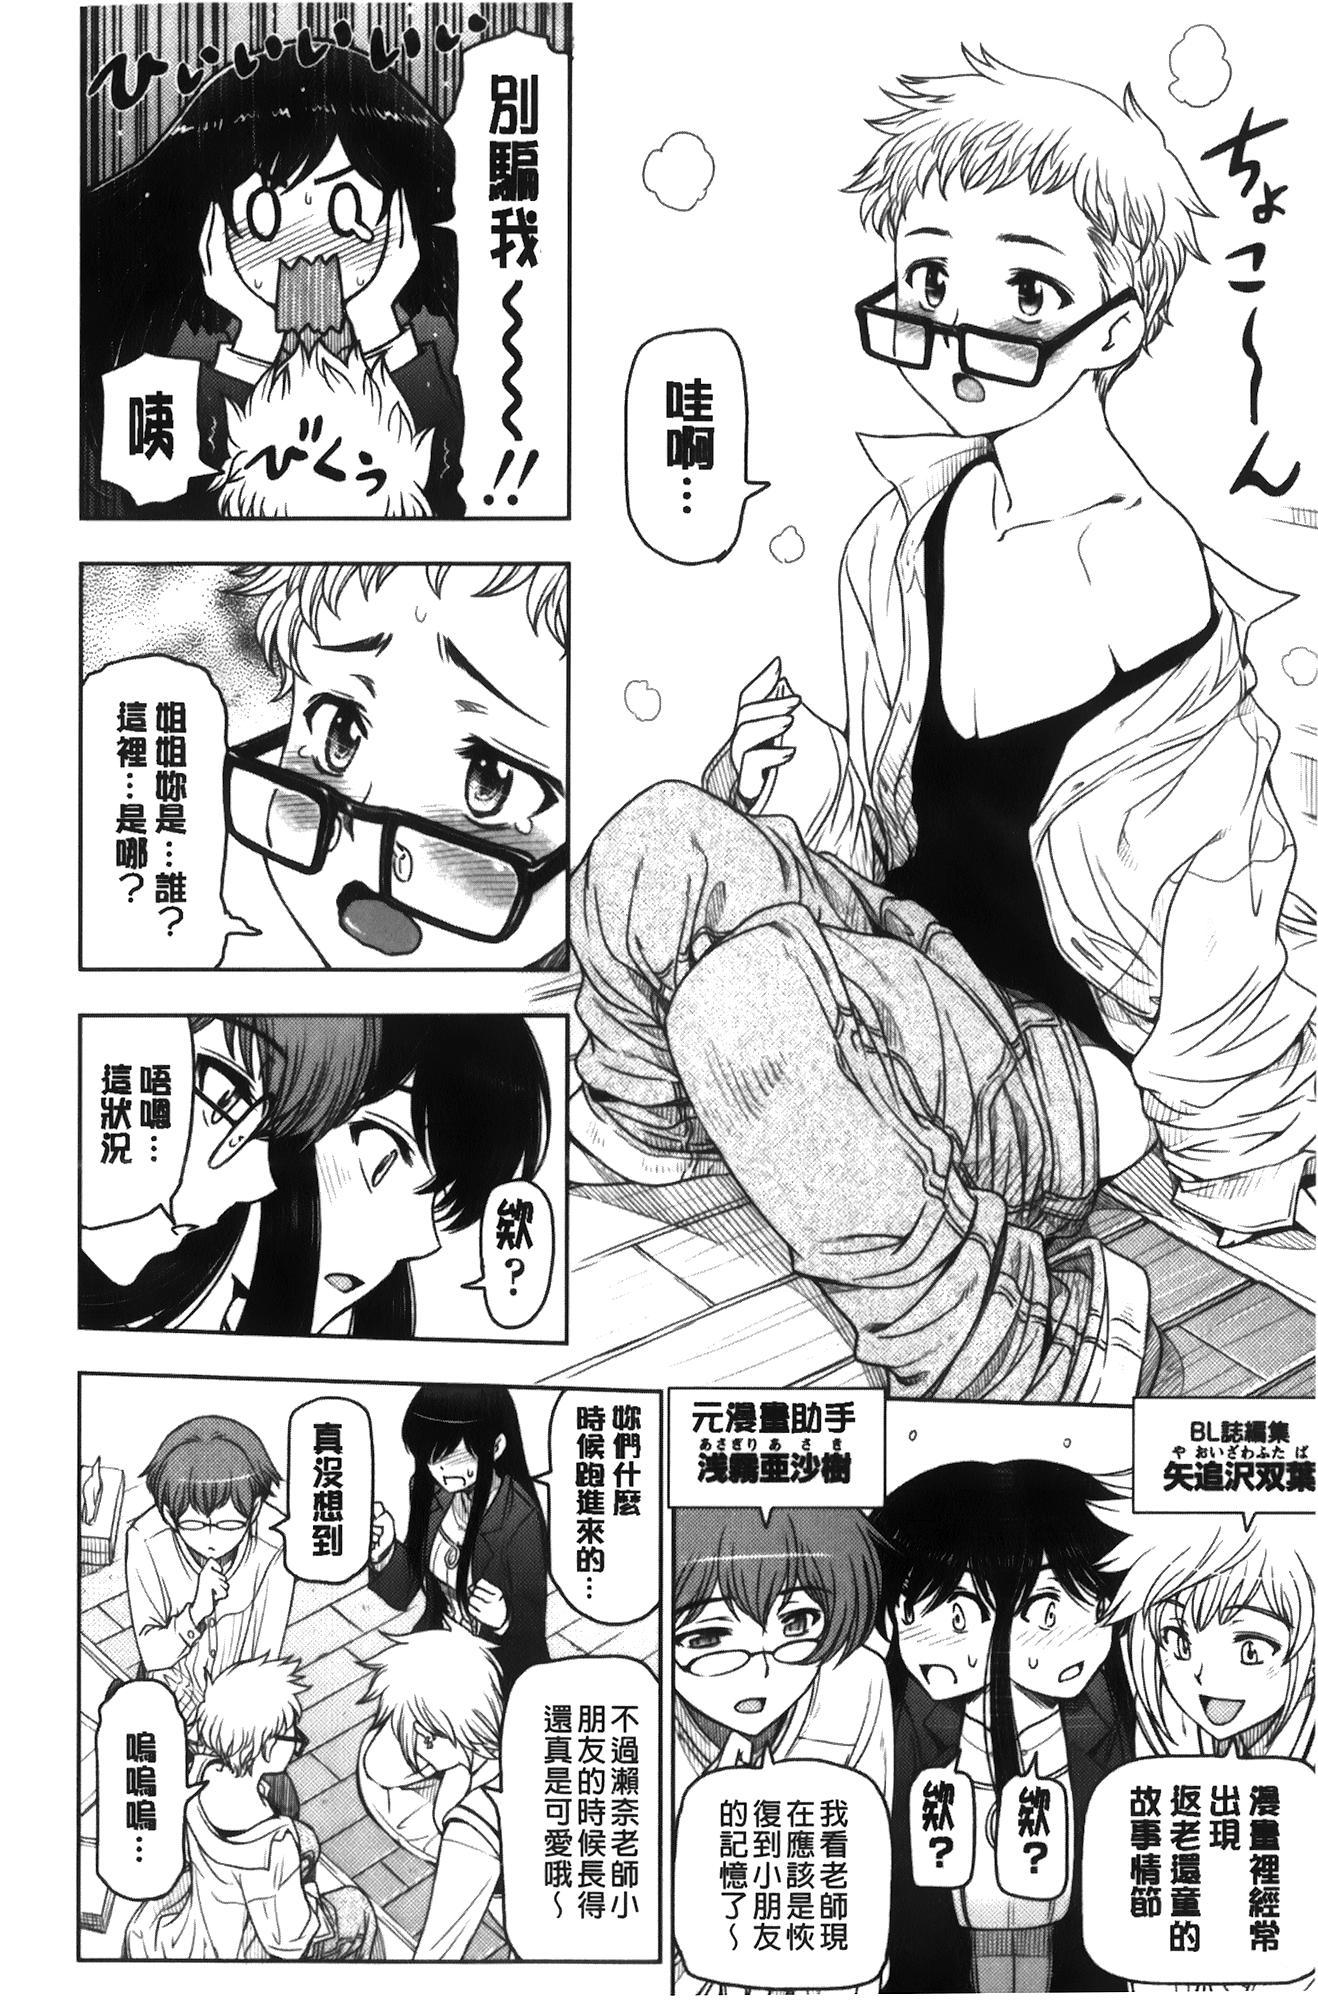 Majo × Shota ~ Genteiban | 魔女X小正太 限定版 238